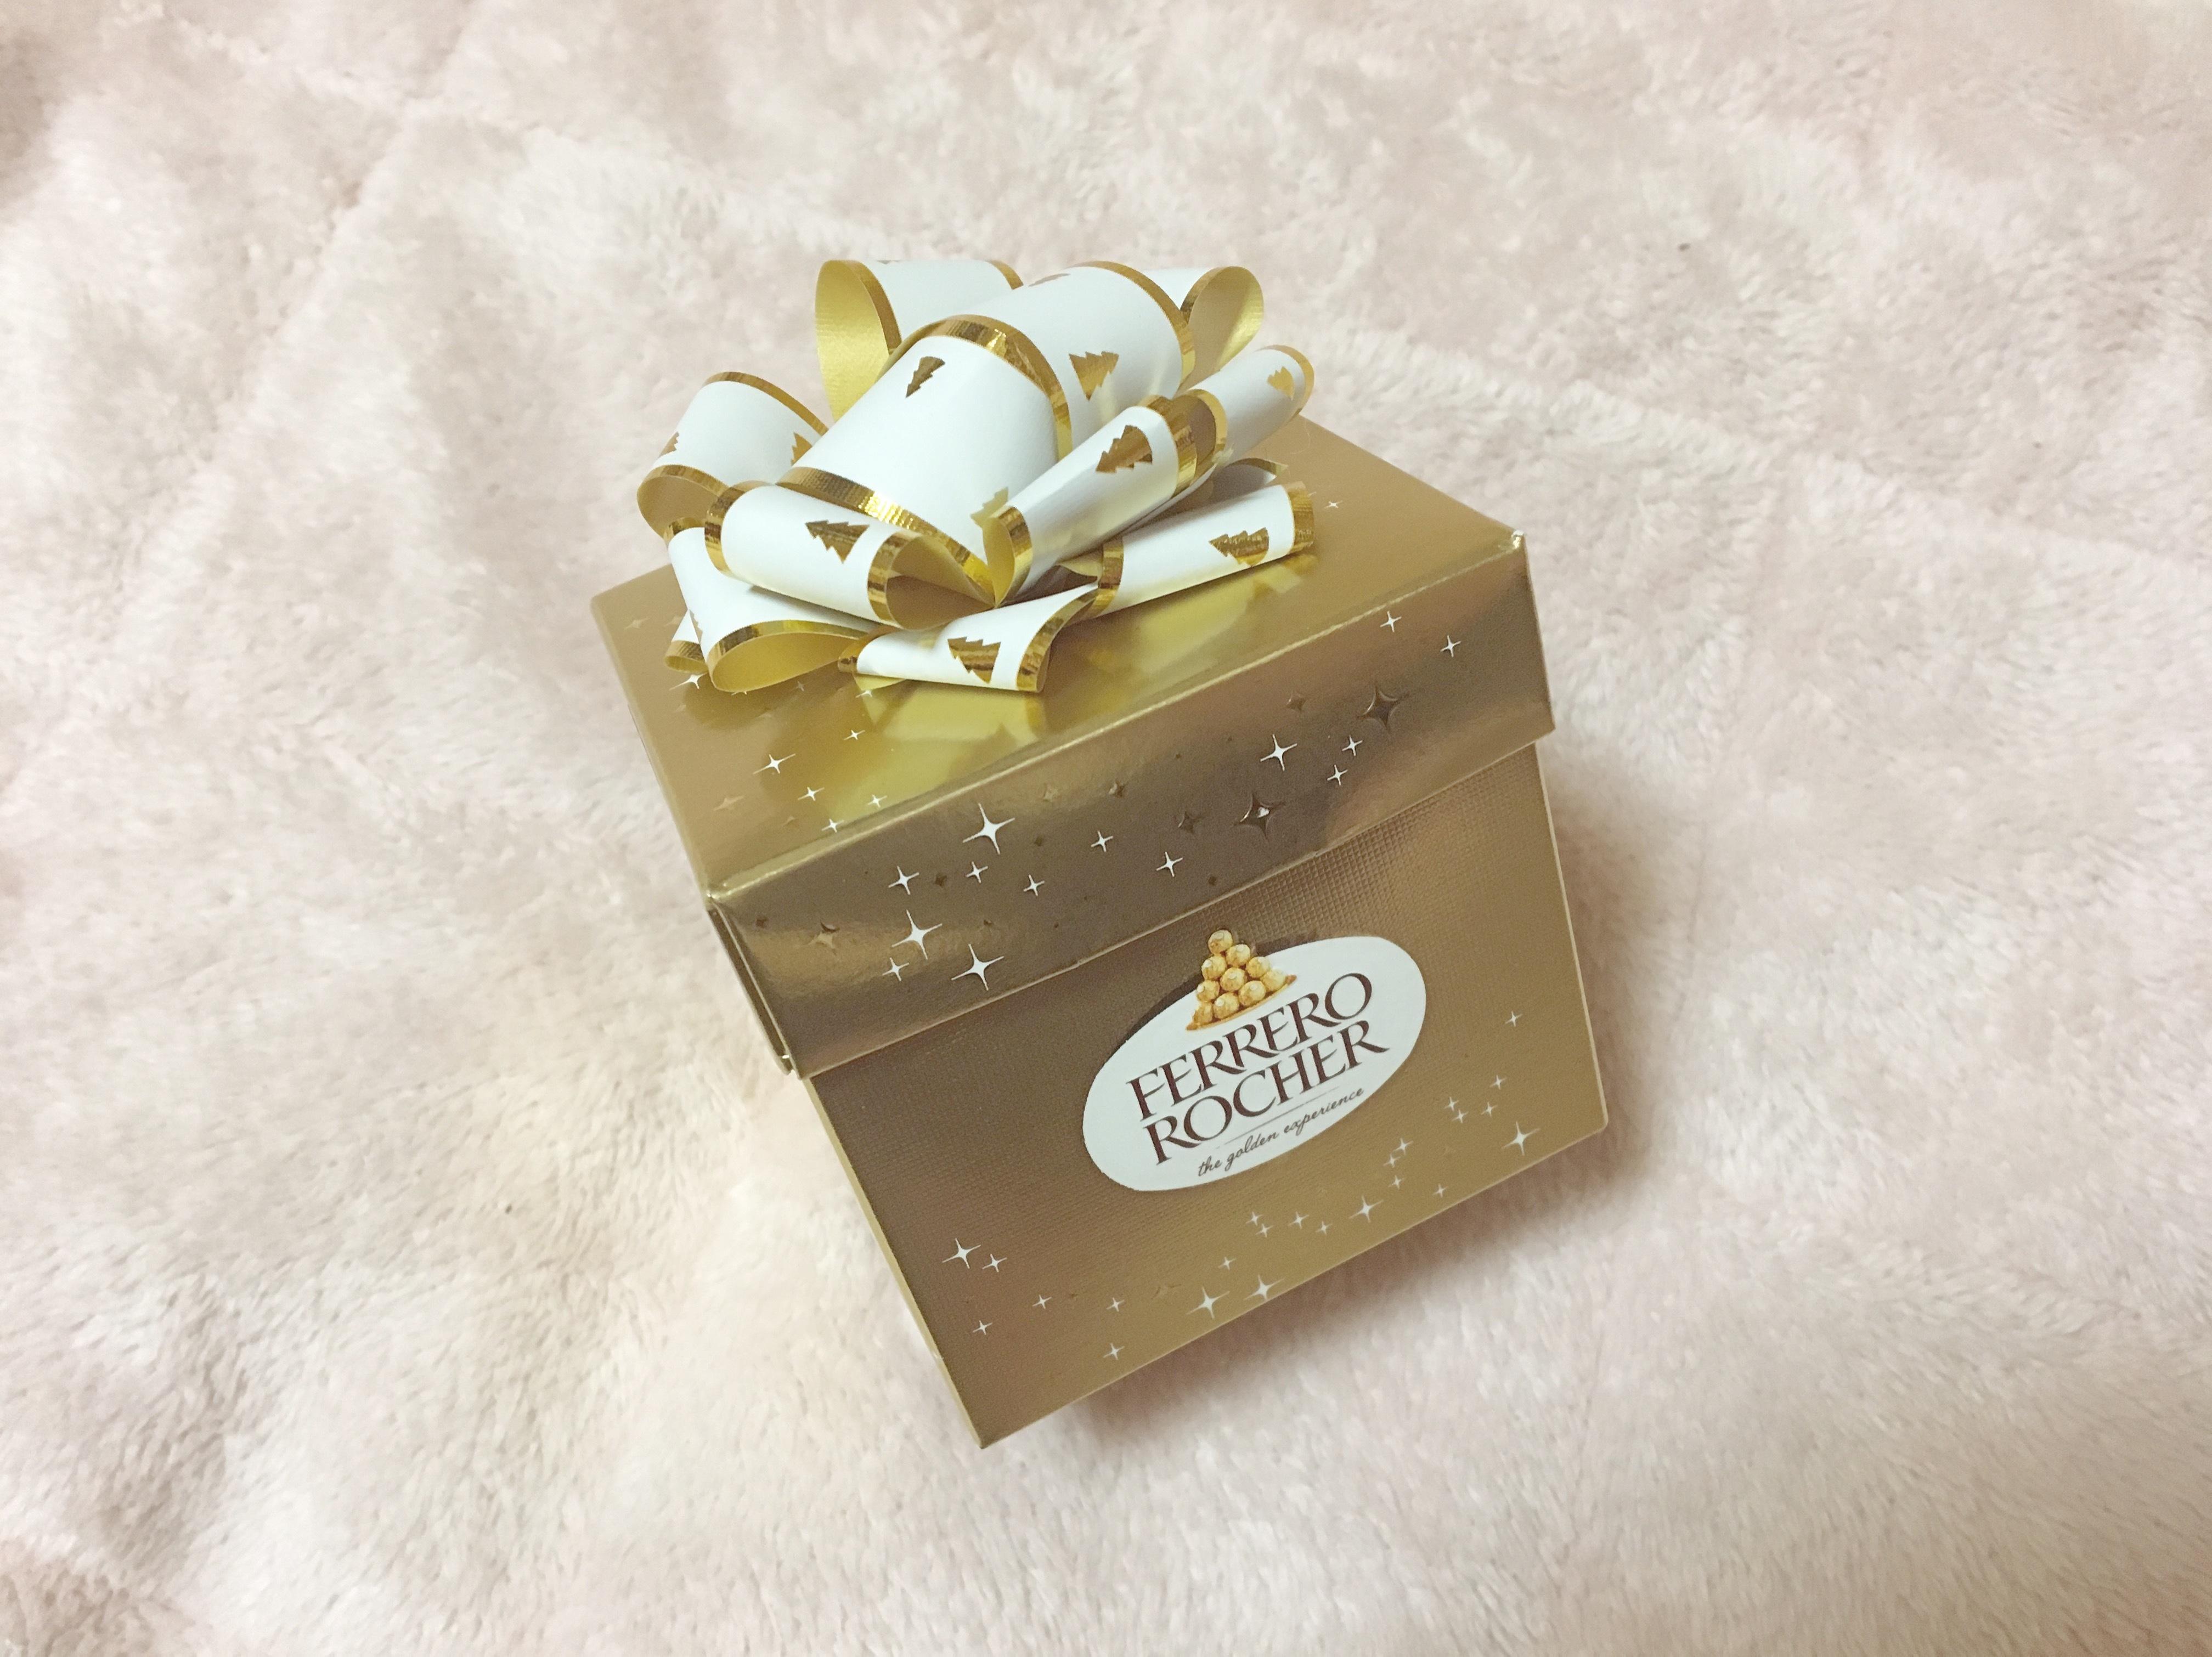 non-no企画★PLAZAでお買い物①プレゼント用にピッタリな高級感あるお菓子_1_5